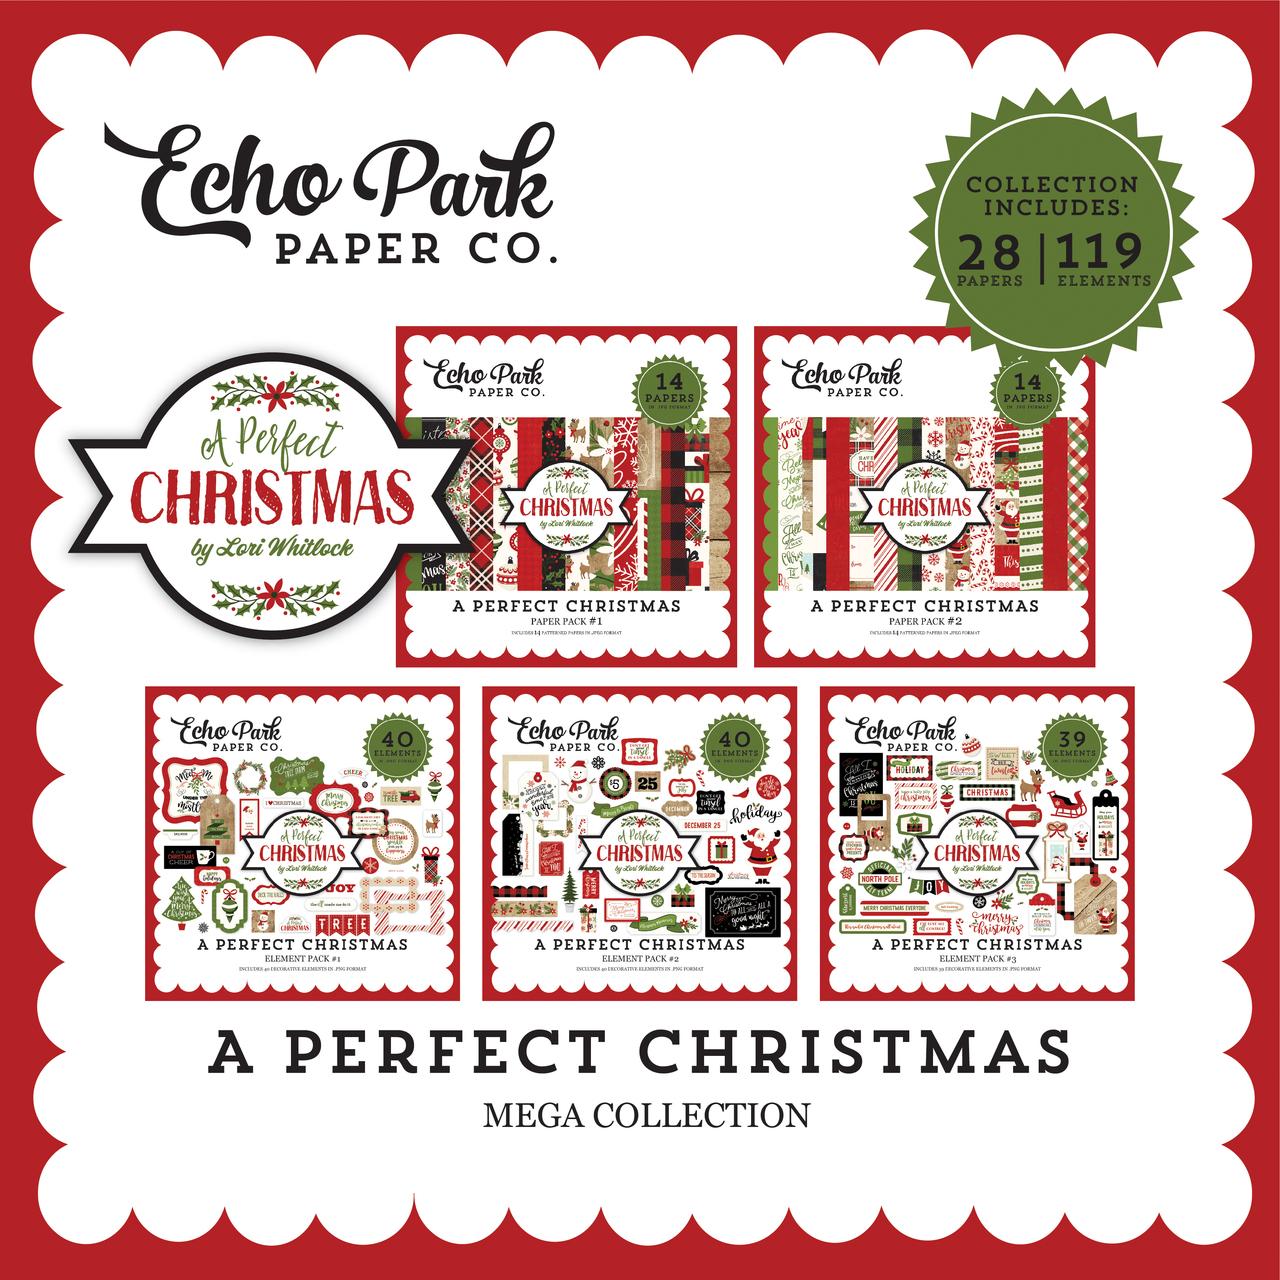 A Perfect Christmas Mega Collection